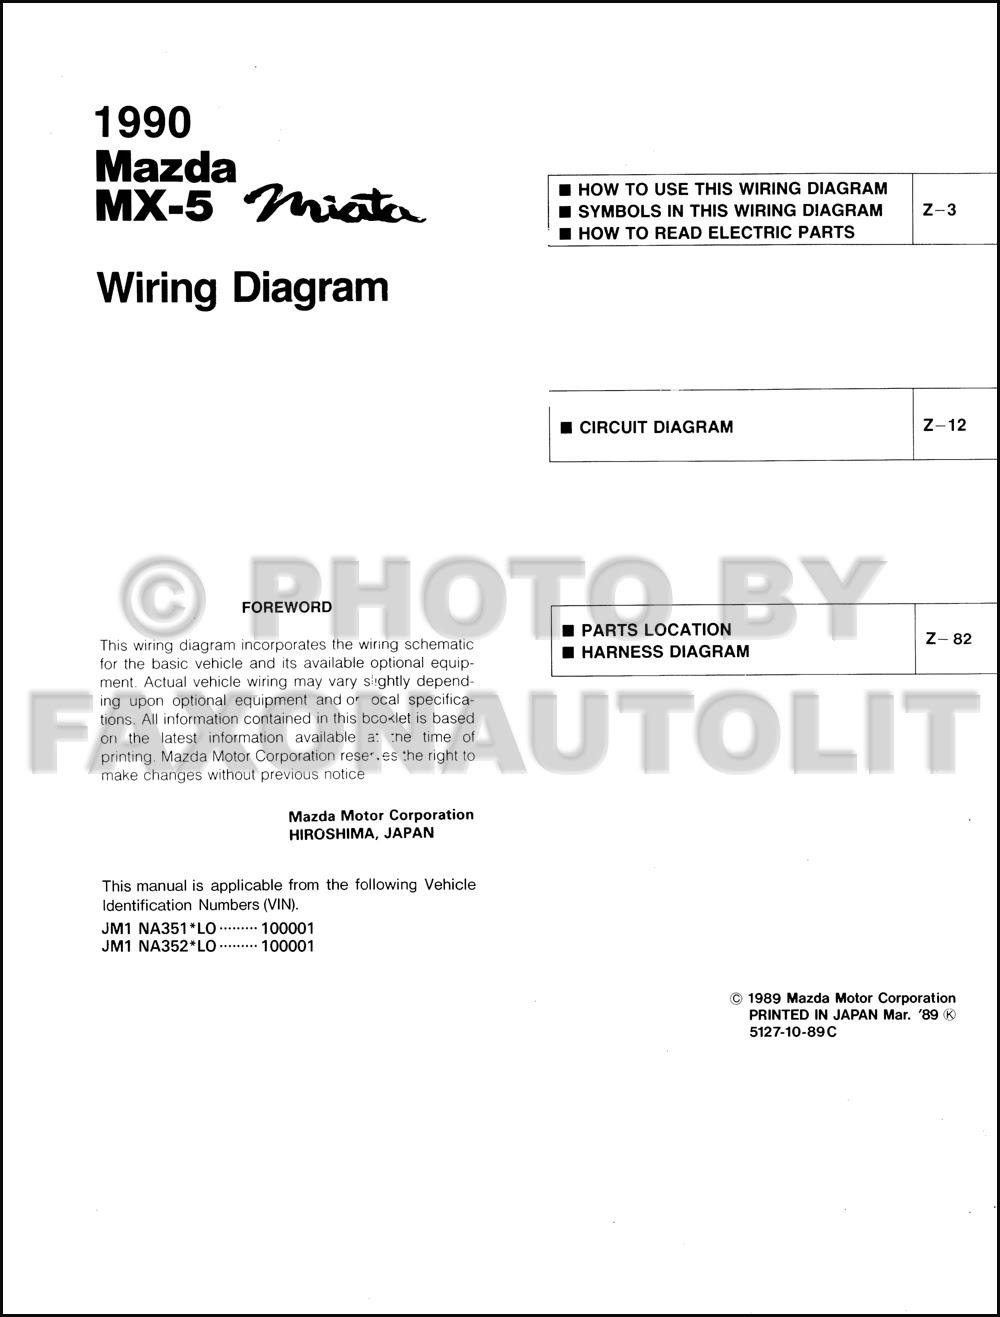 Wiring Diagram  28 1990 Mazda Miata Wiring Diagram